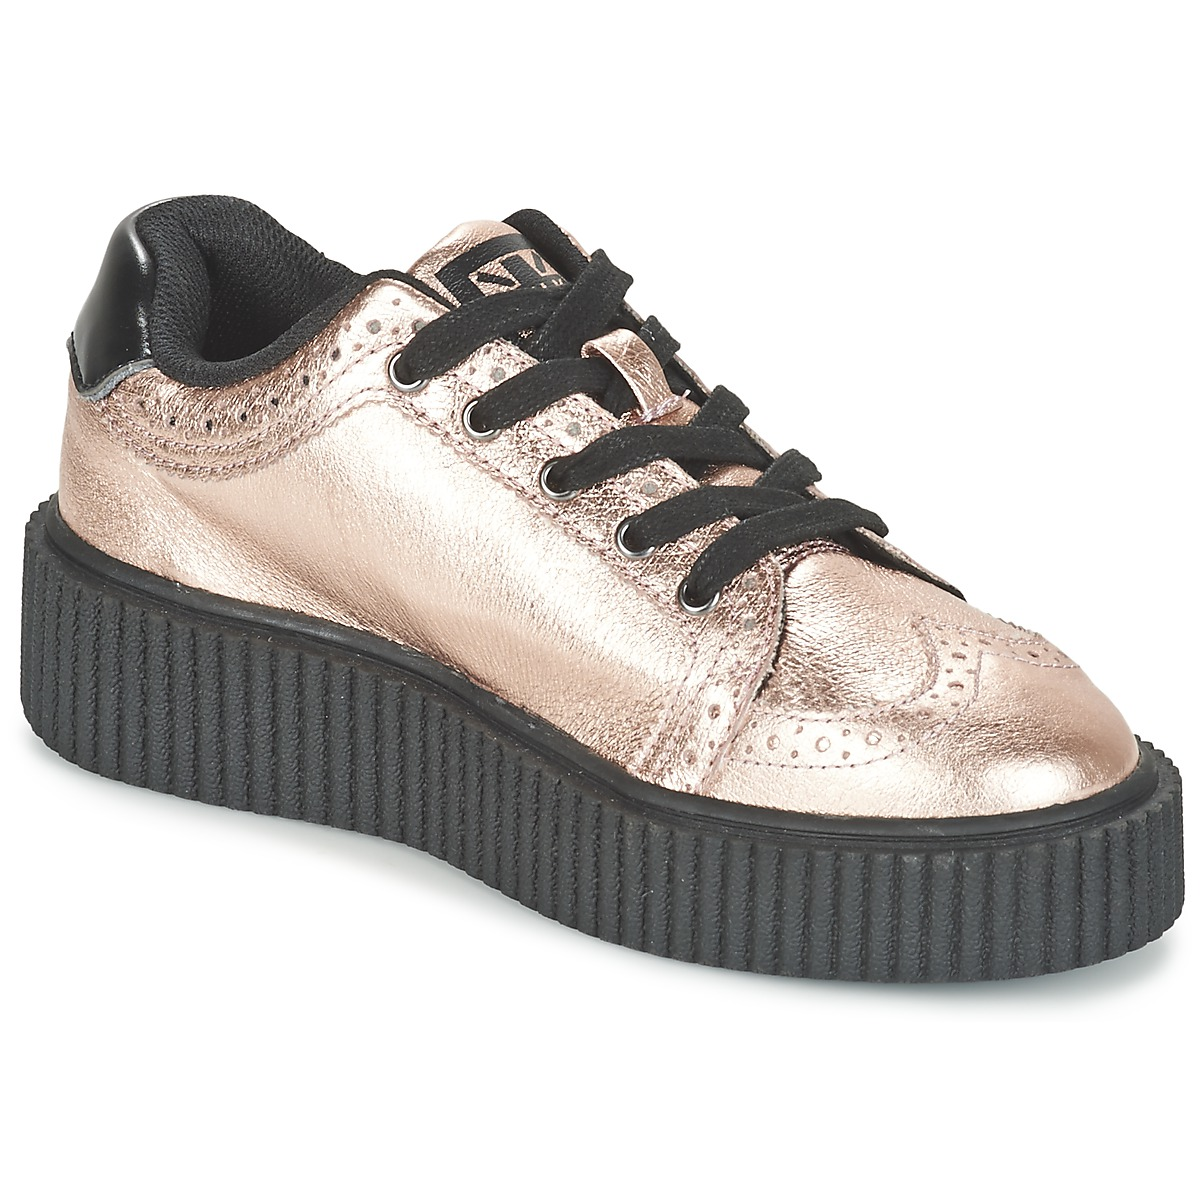 TUK CASBAH CREEPERS Rose - Kostenloser Versand bei Spartoode ! - Schuhe Sneaker Low Damen 59,50 €